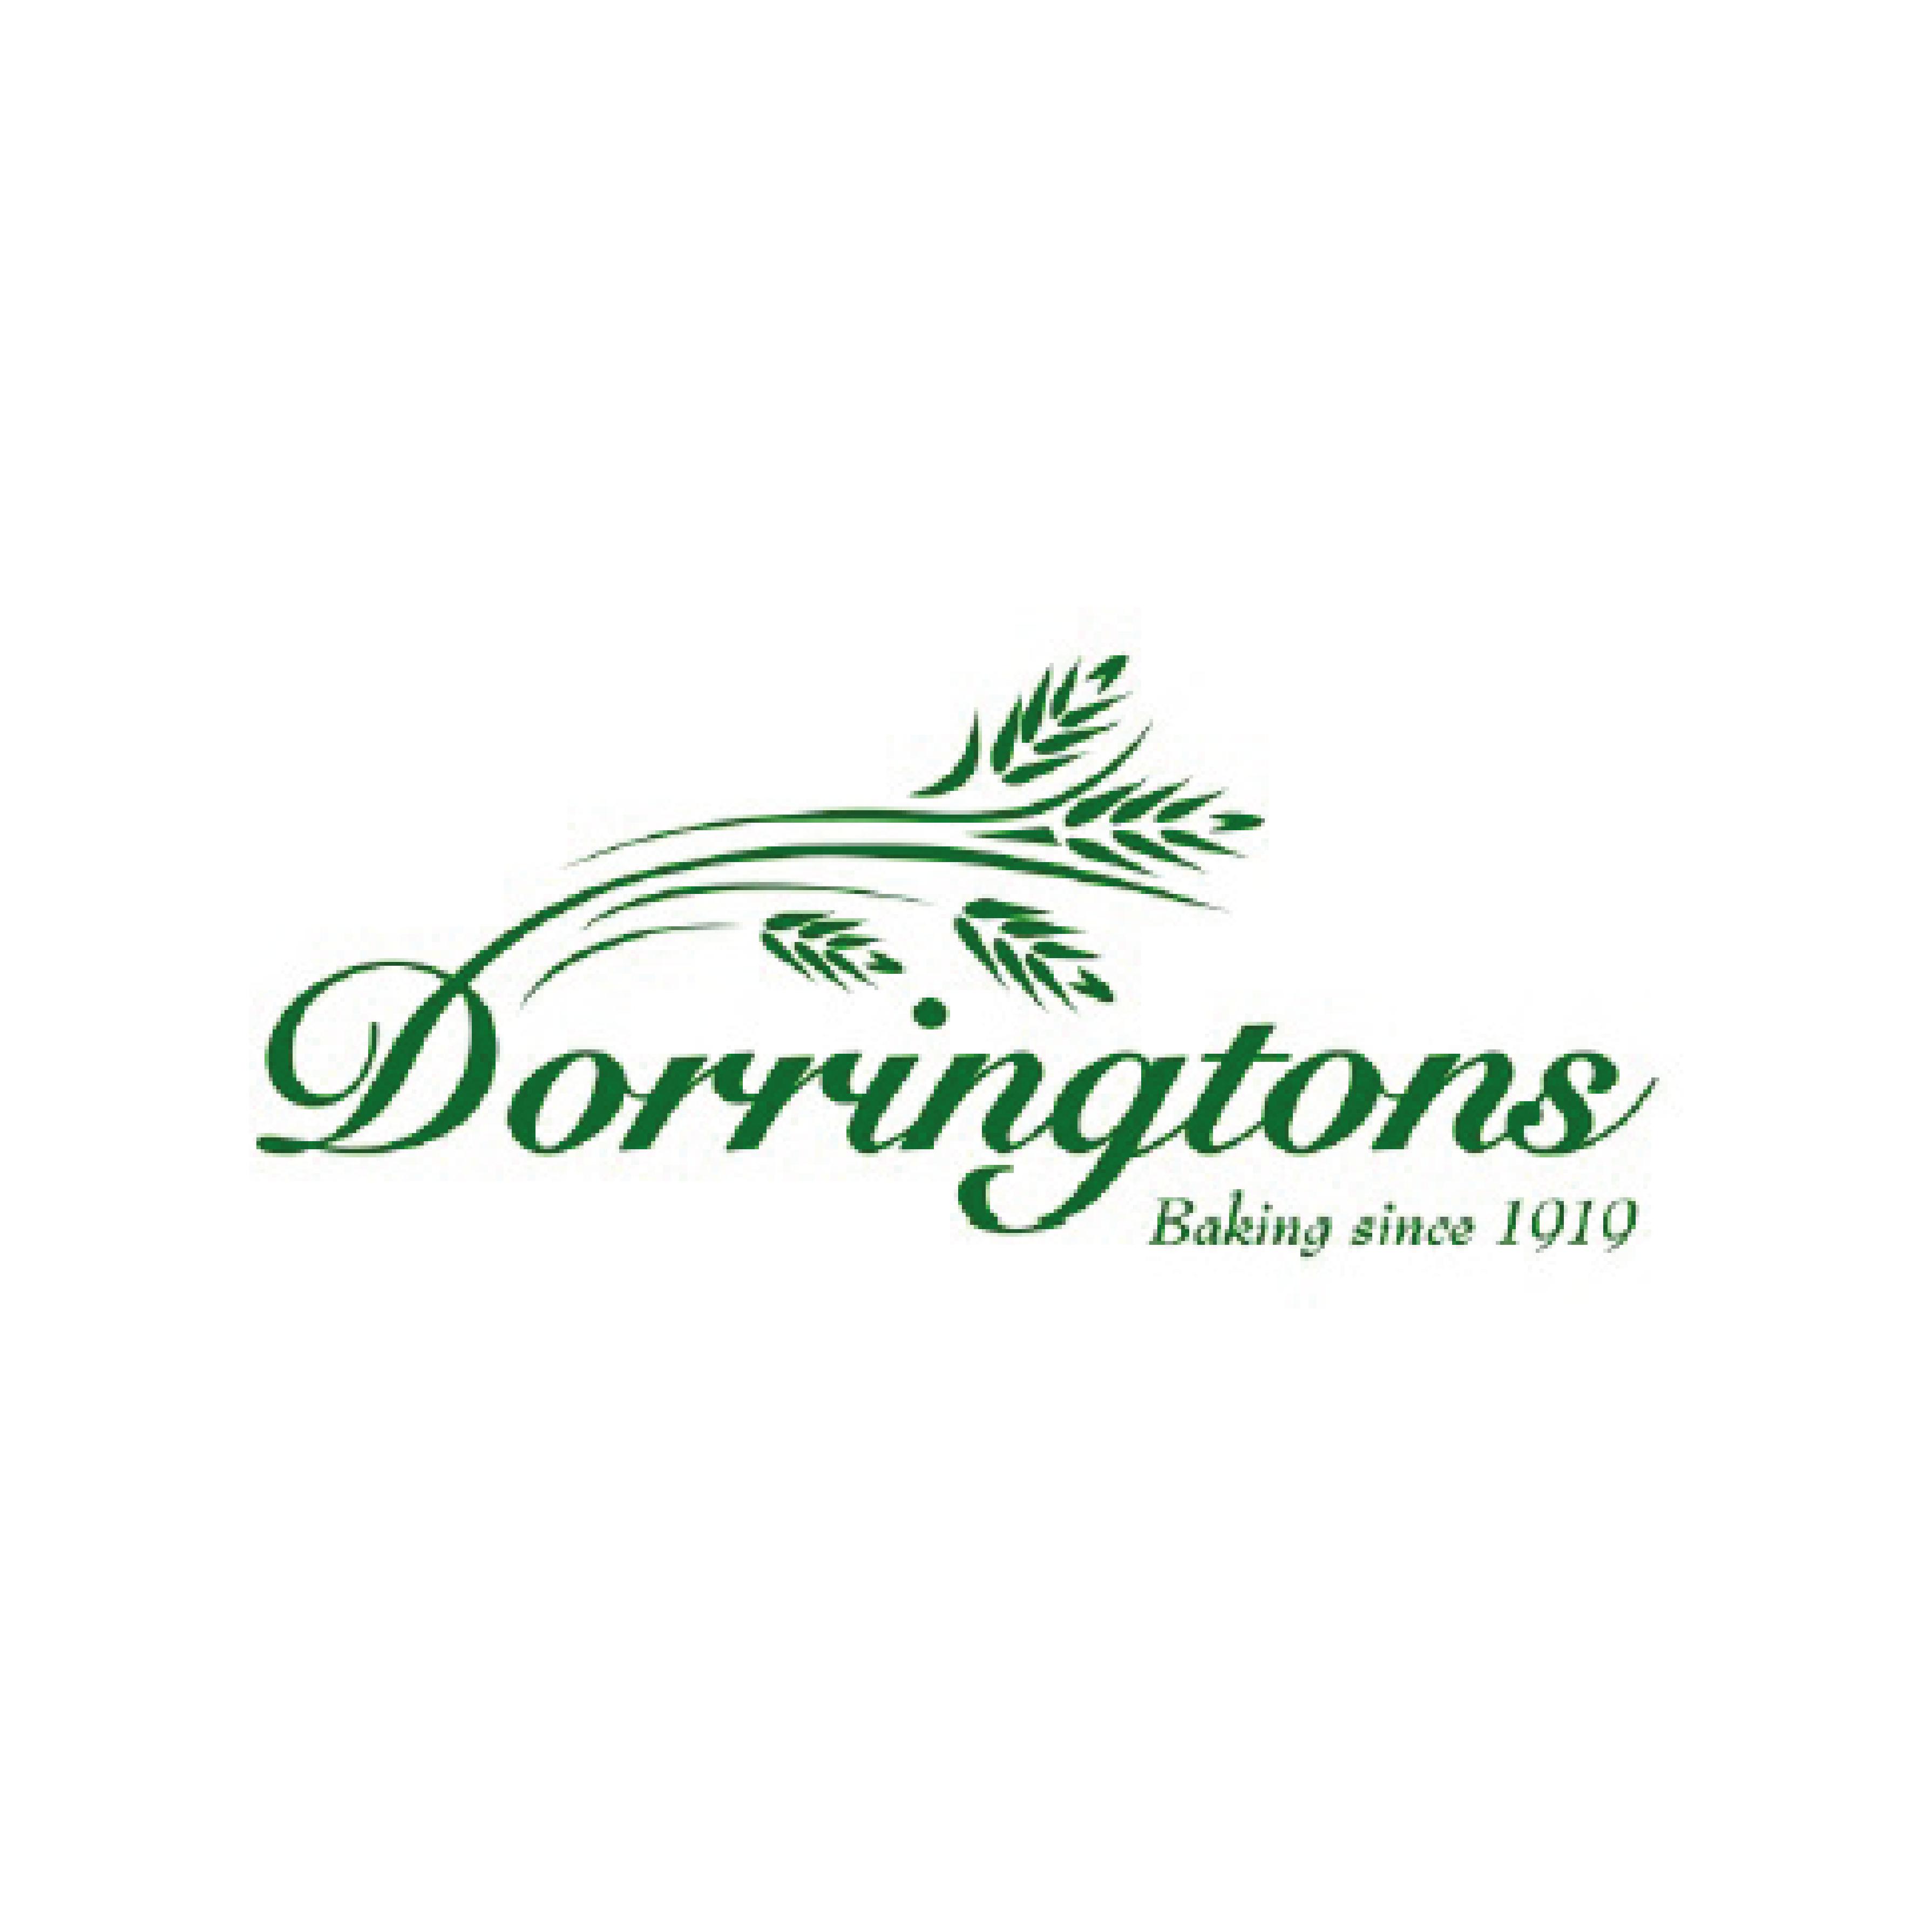 Dorringtons